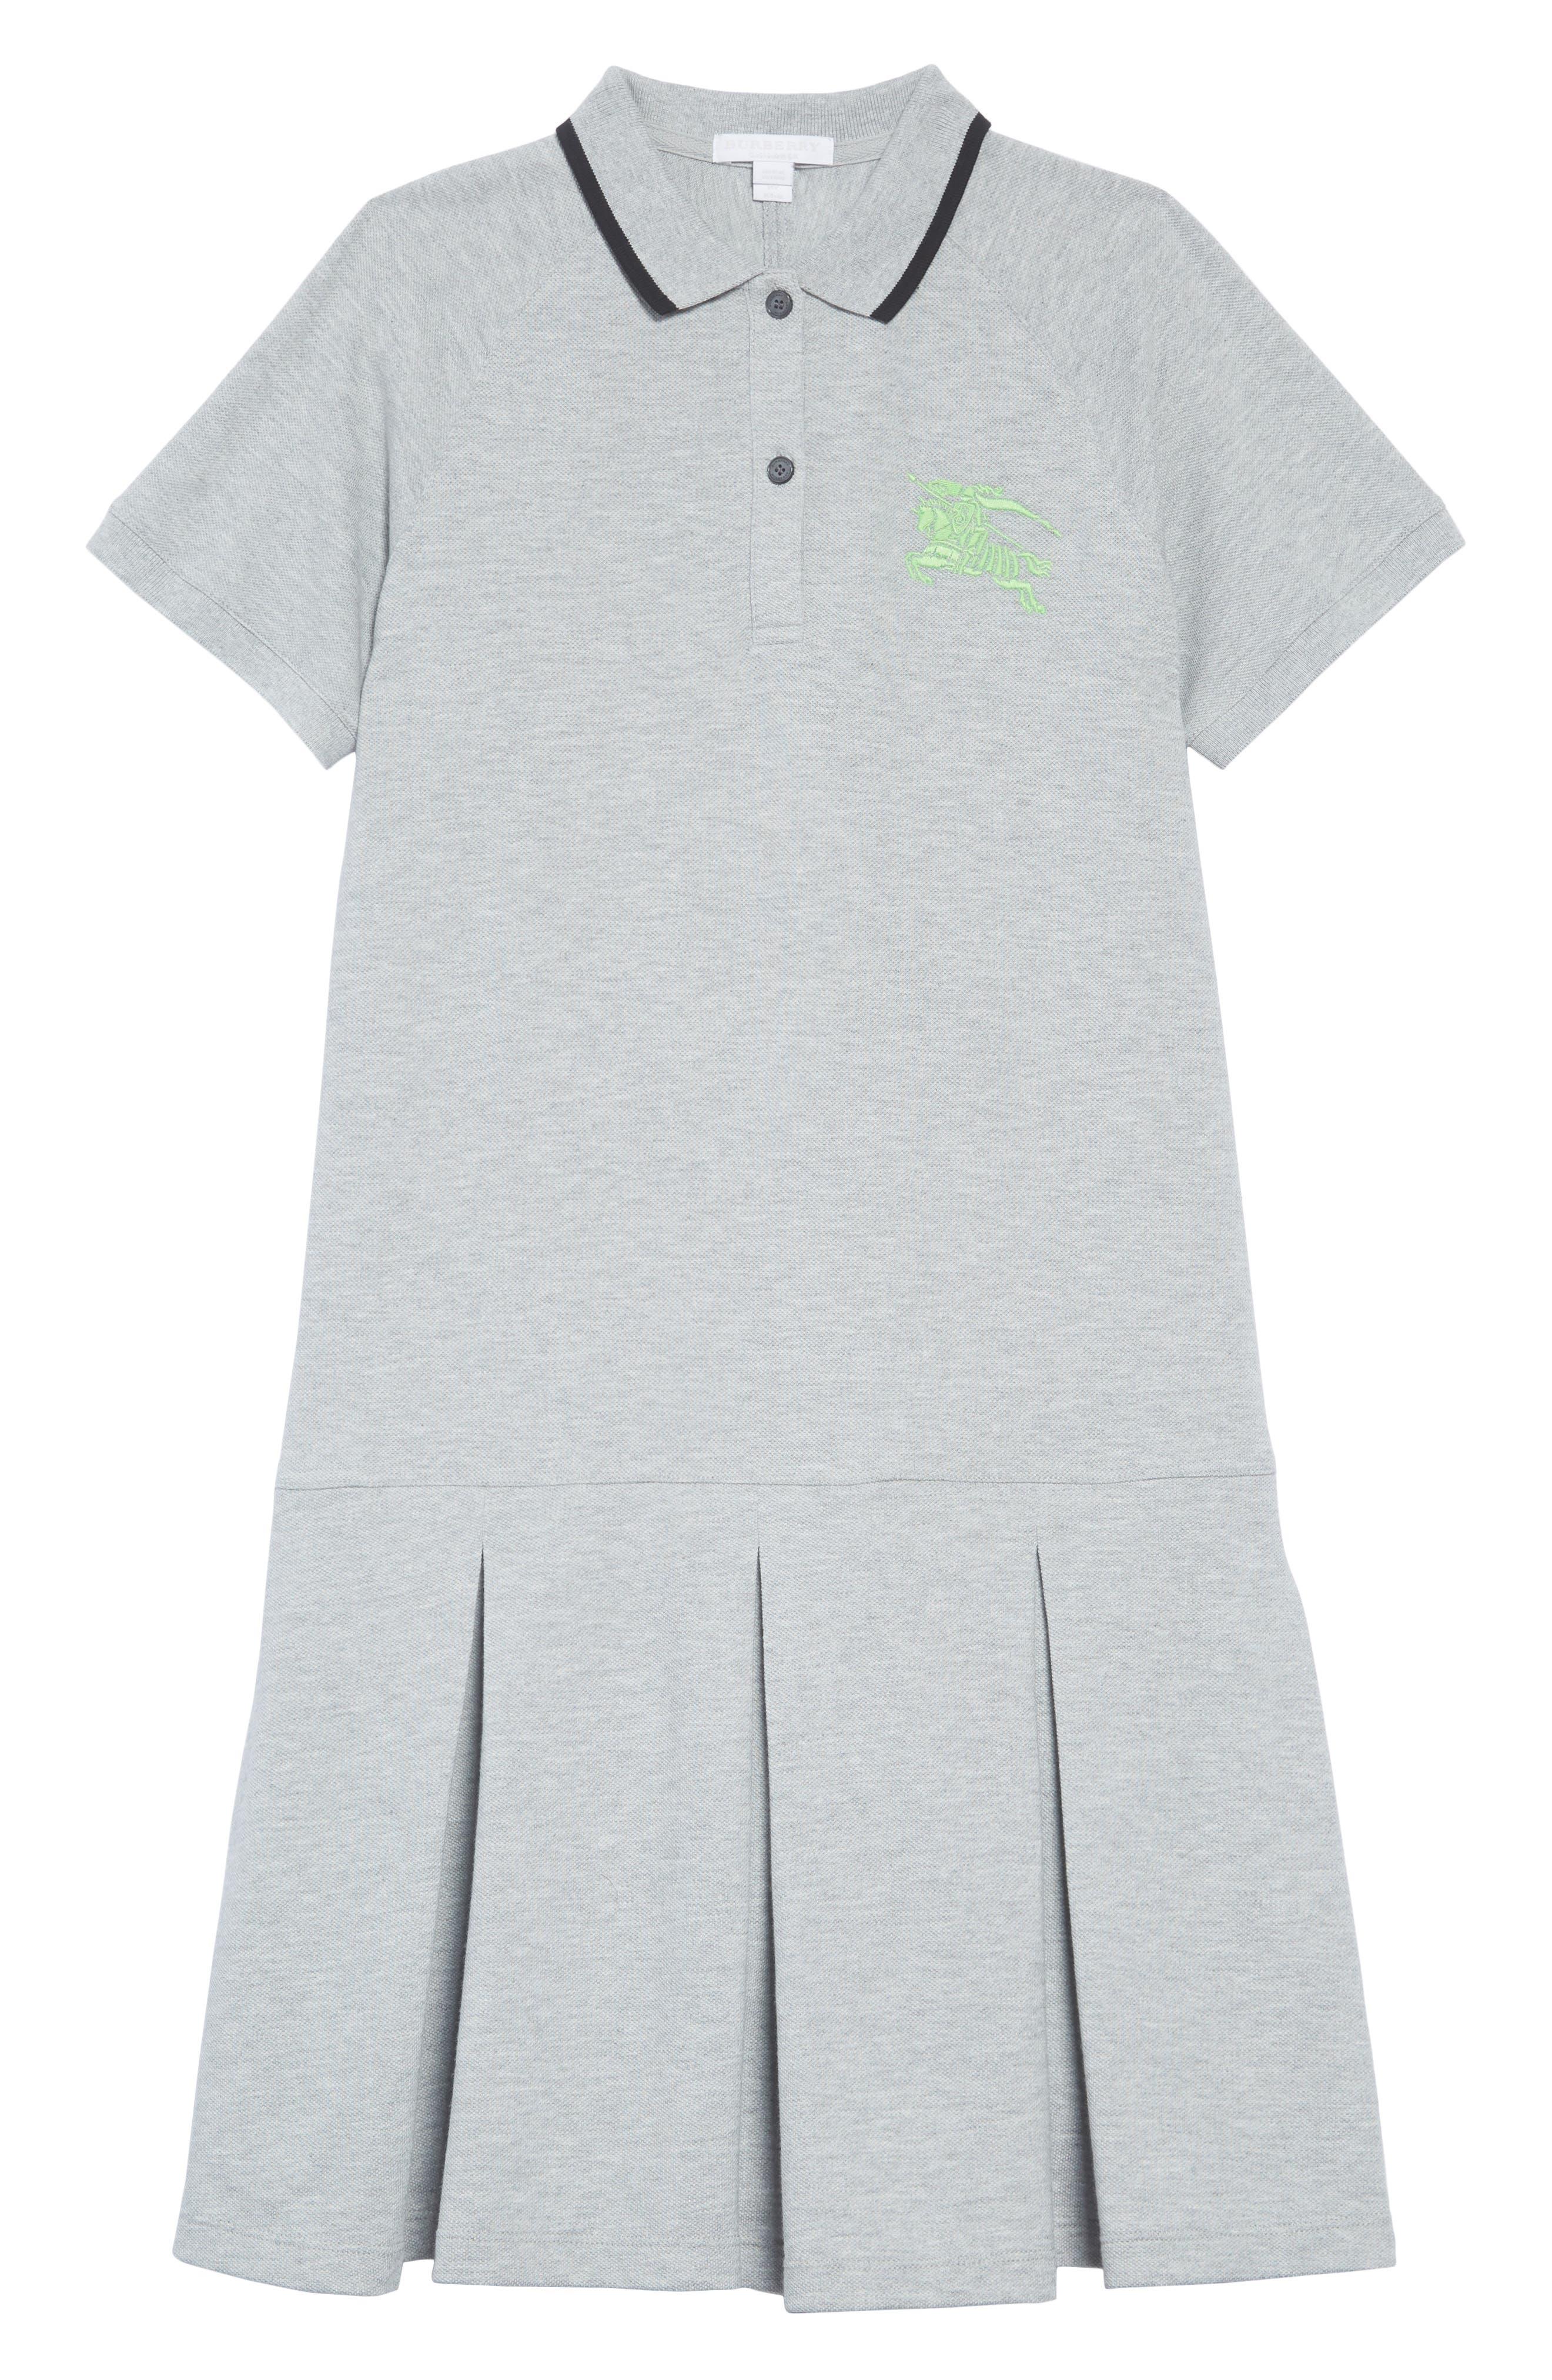 Mollyanna Polo Dress,                             Main thumbnail 1, color,                             GREY MELANGE